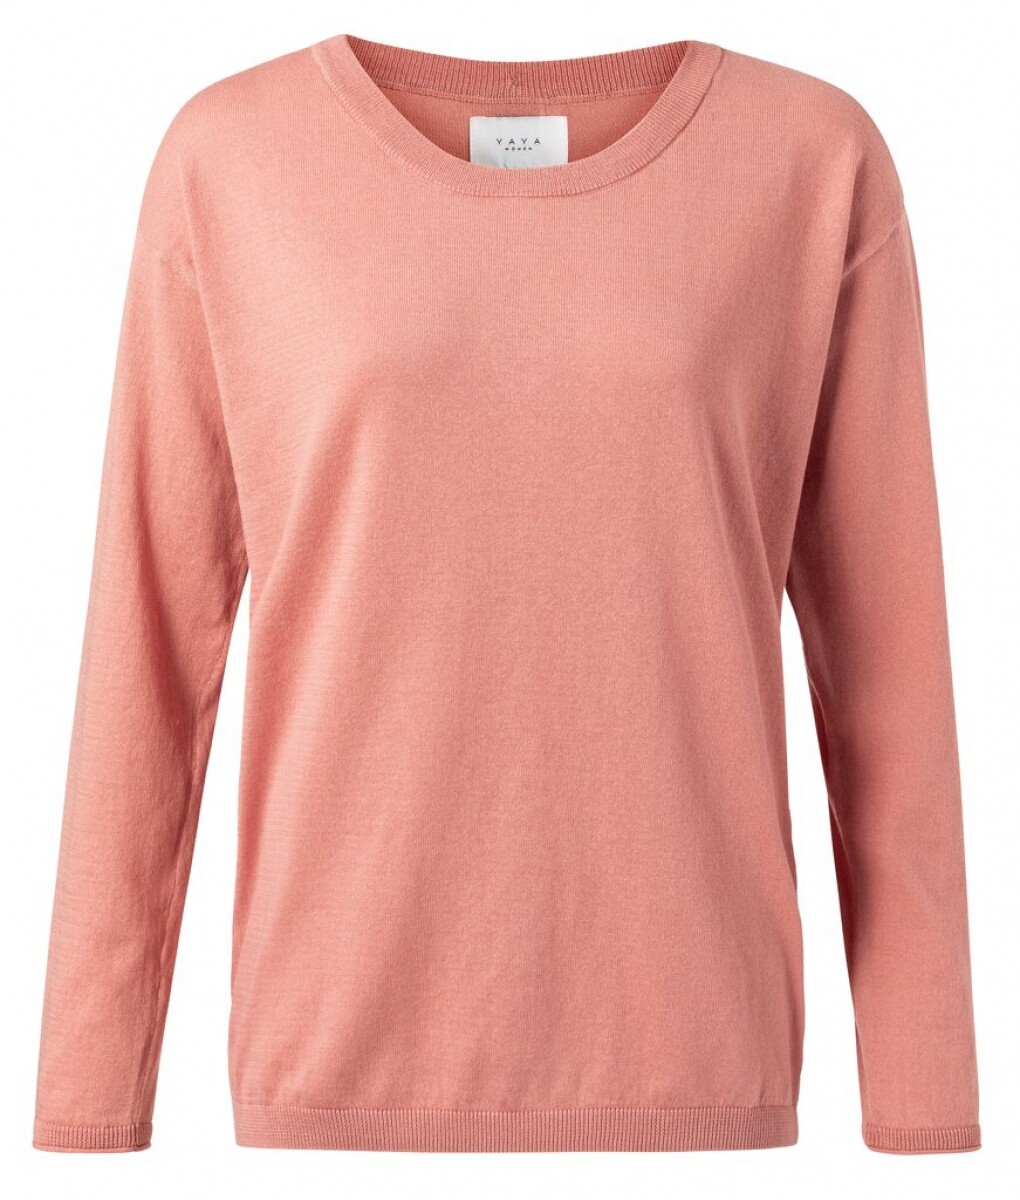 YAYA Sweater buttons 100% Cotton ROSE DAWN